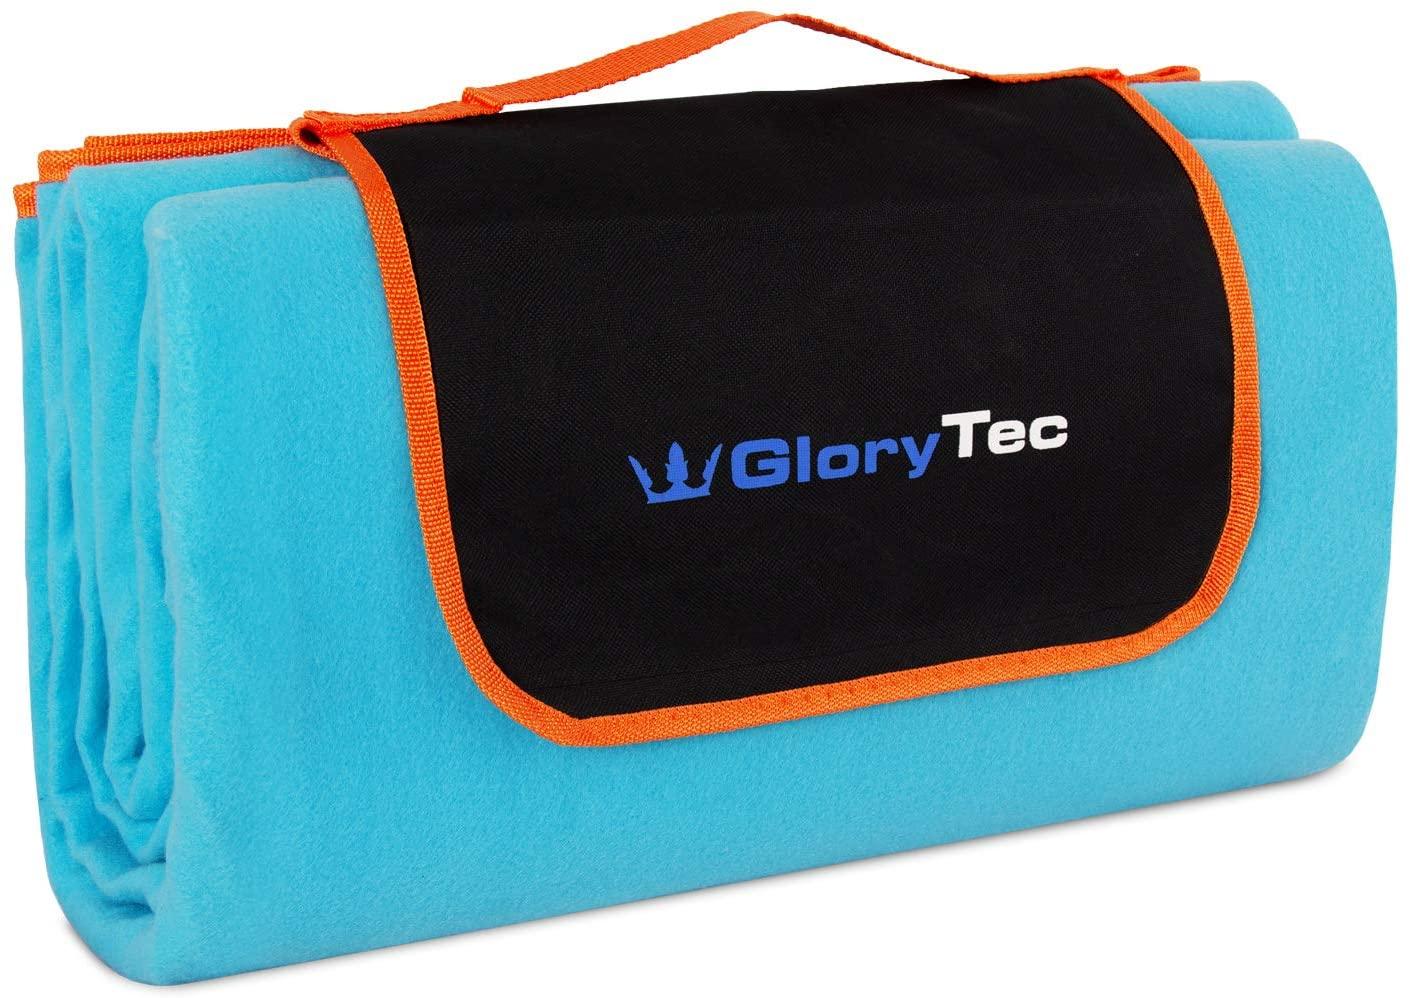 Glorytec Extra Large Picnic & Outdoor Blanket 78